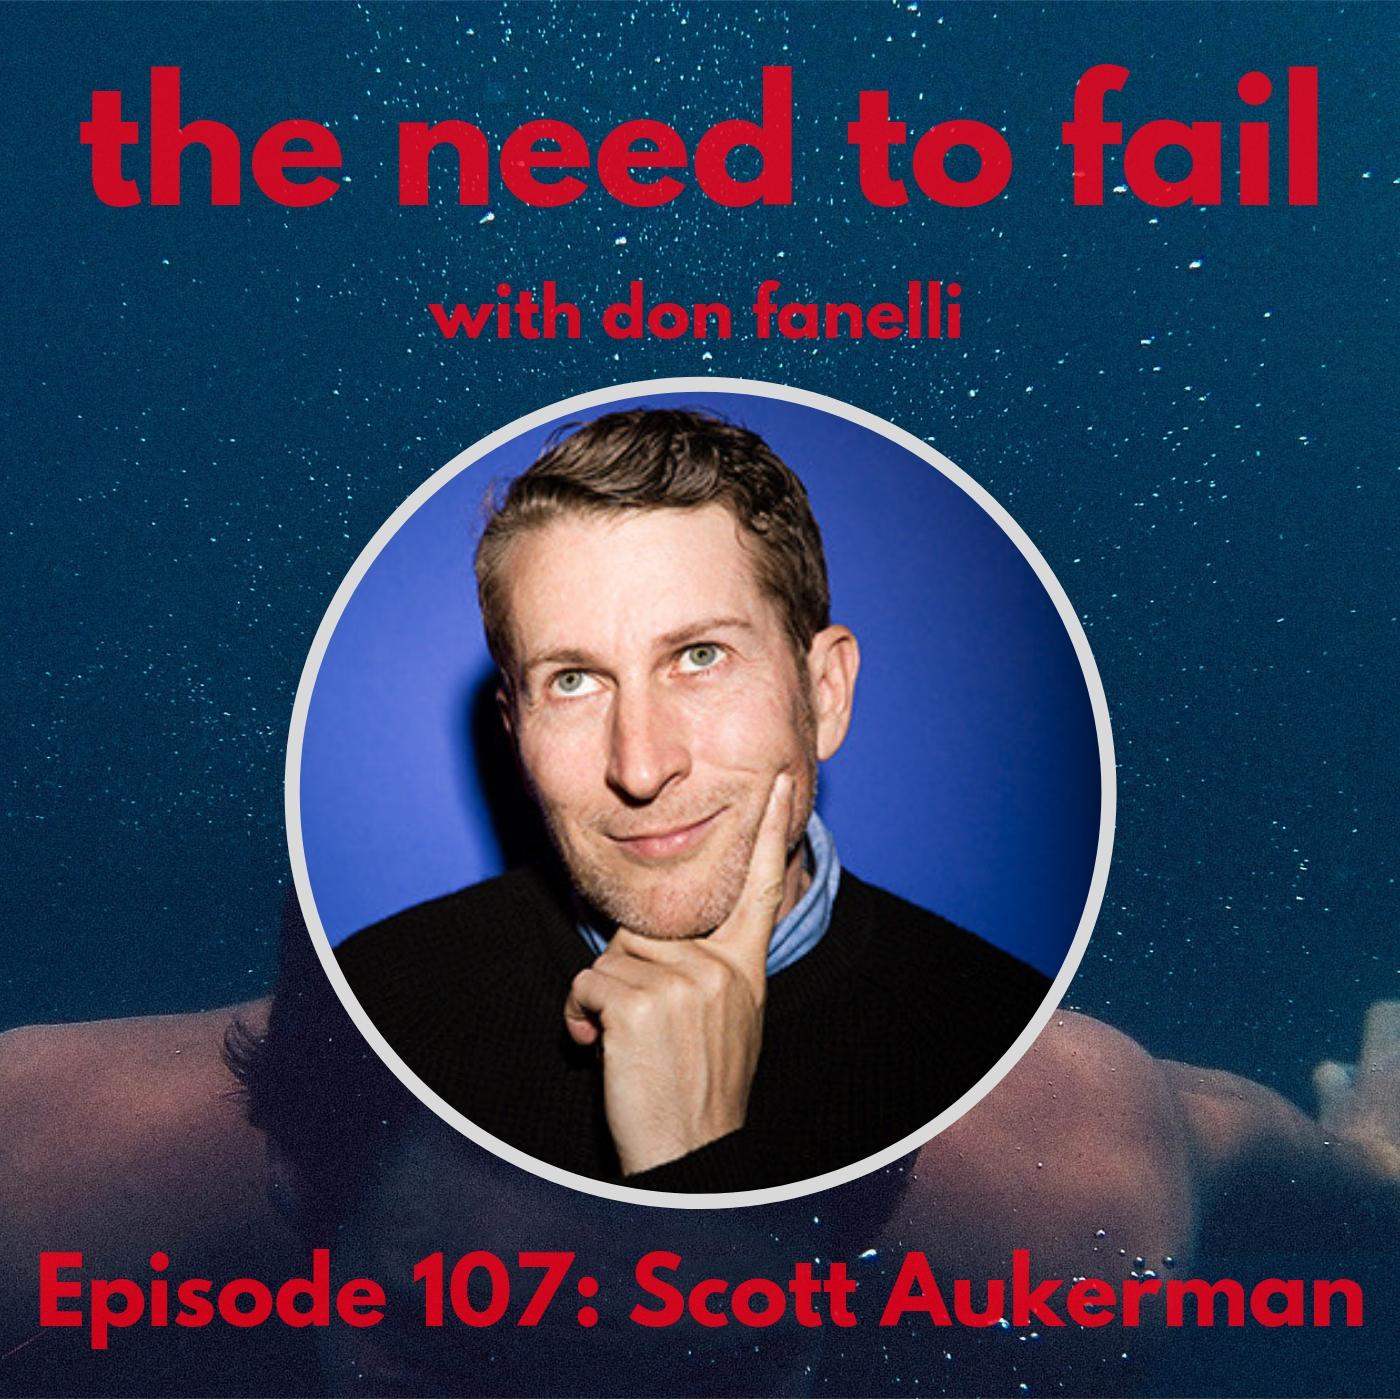 Episode 107: Scott Aukerman